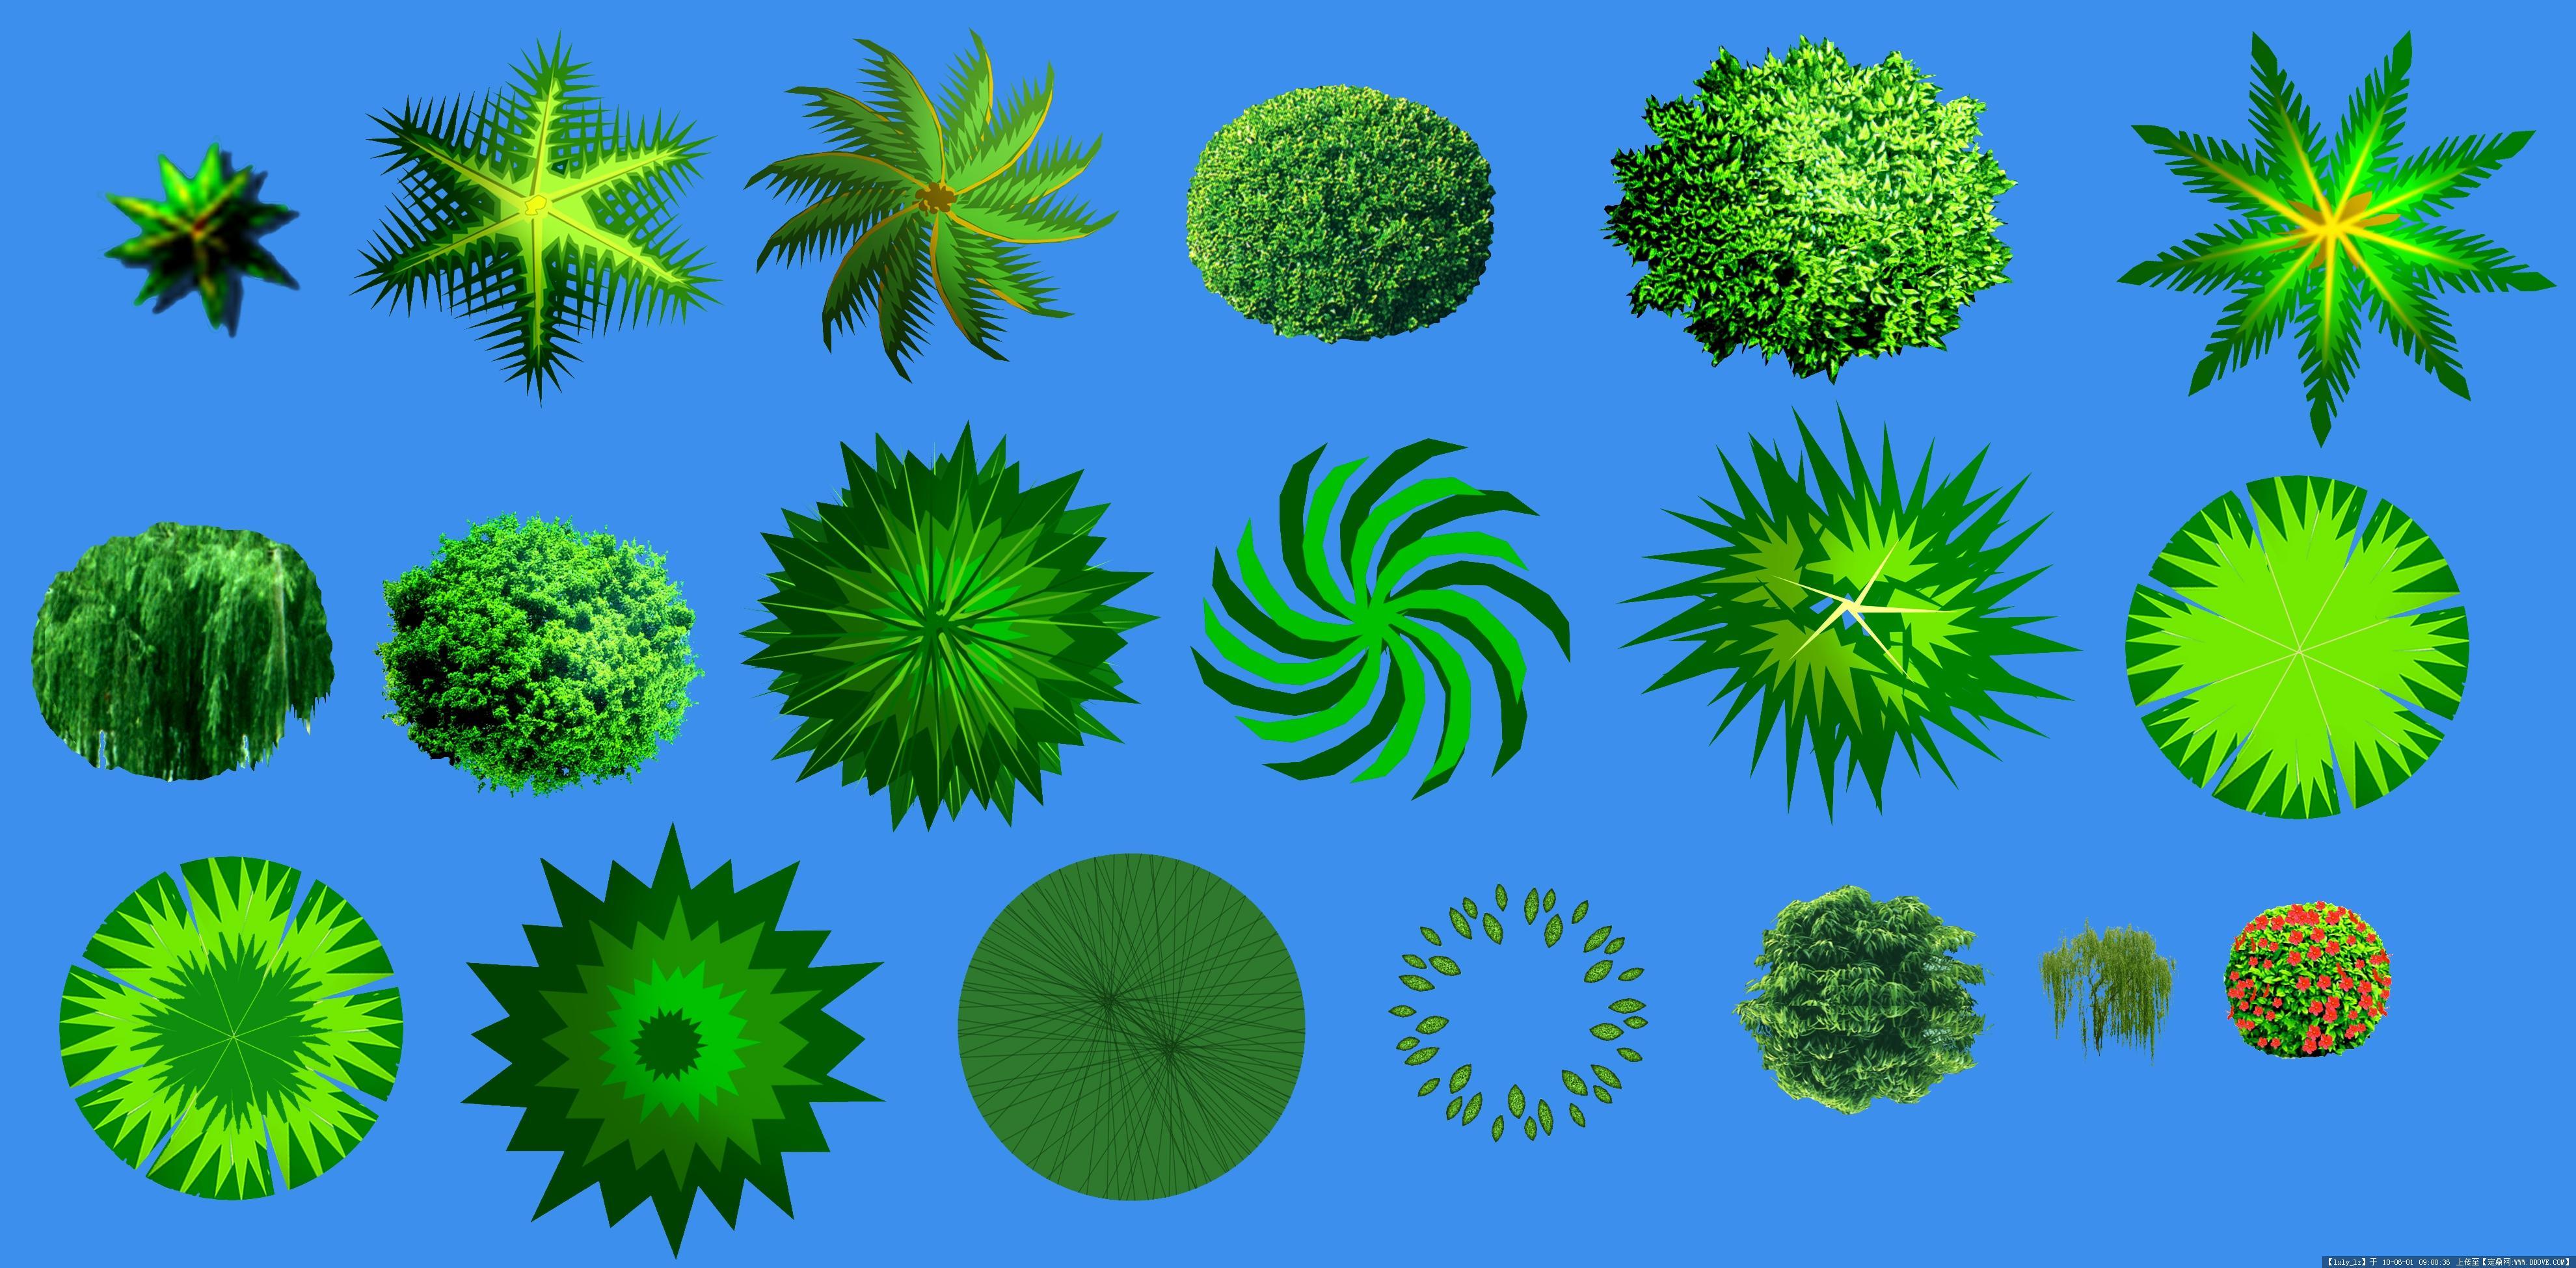 ps平面-植物平面图例素材的图片浏览